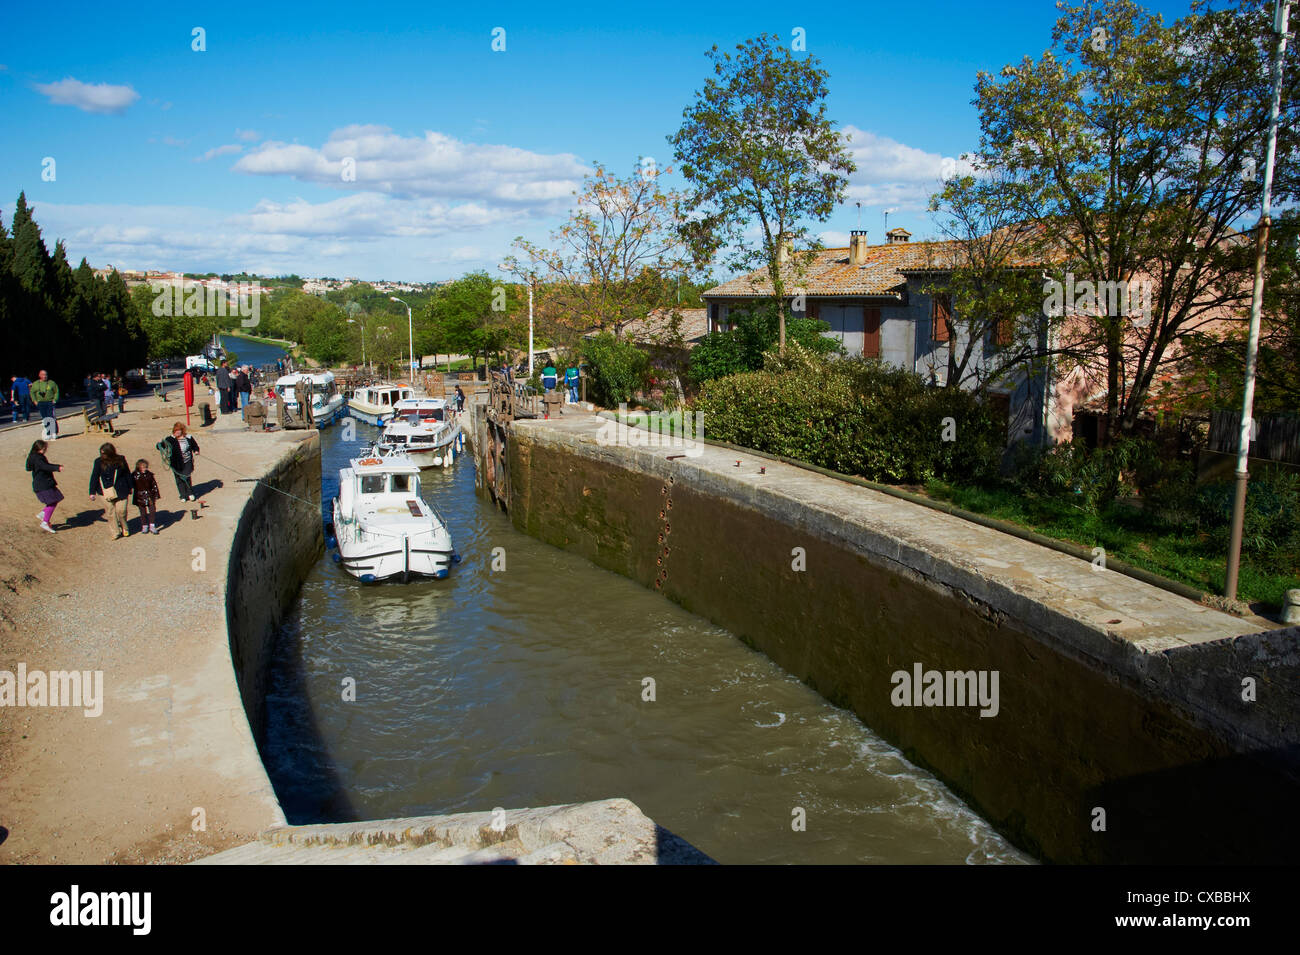 Locks of Fonserannes, Canal du Midi, UNESCO World Heritage Site, Beziers, Herault, Languedoc, France, Europe - Stock Image